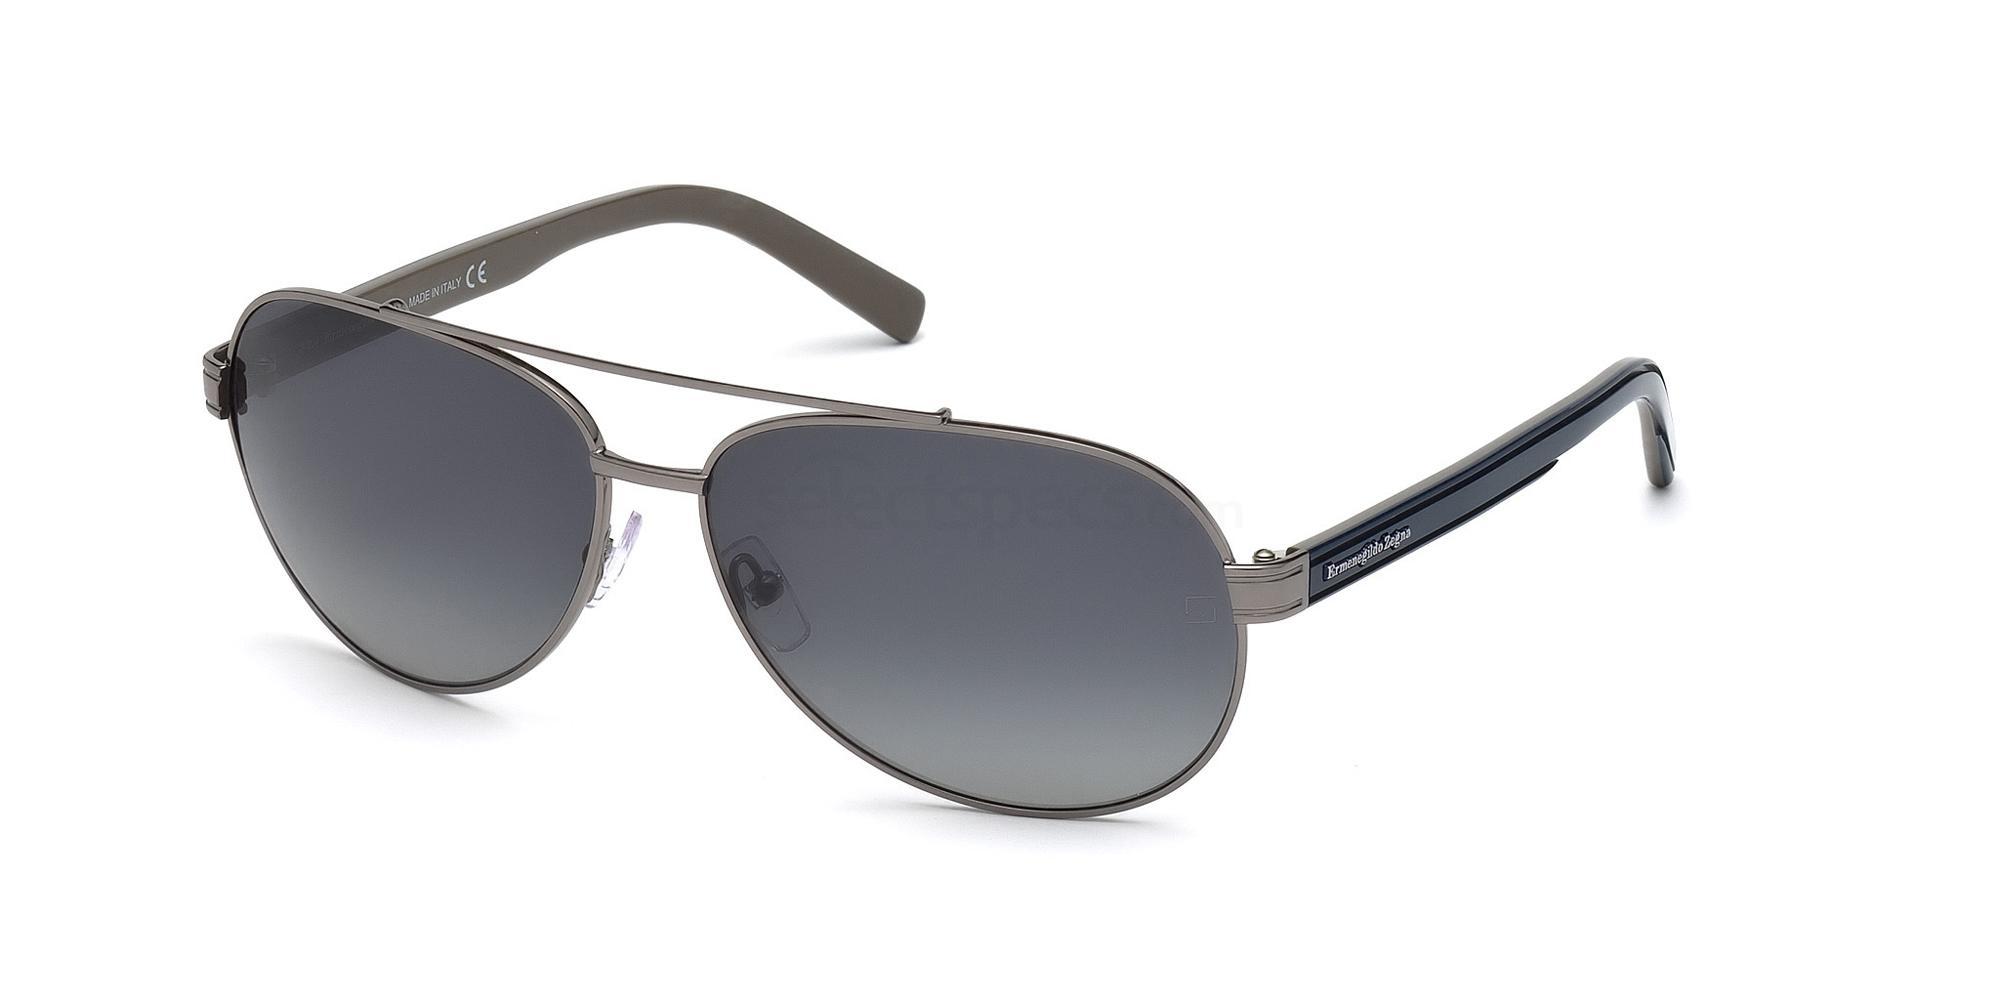 08D EZ0004 Sunglasses, Ermenegildo Zegna